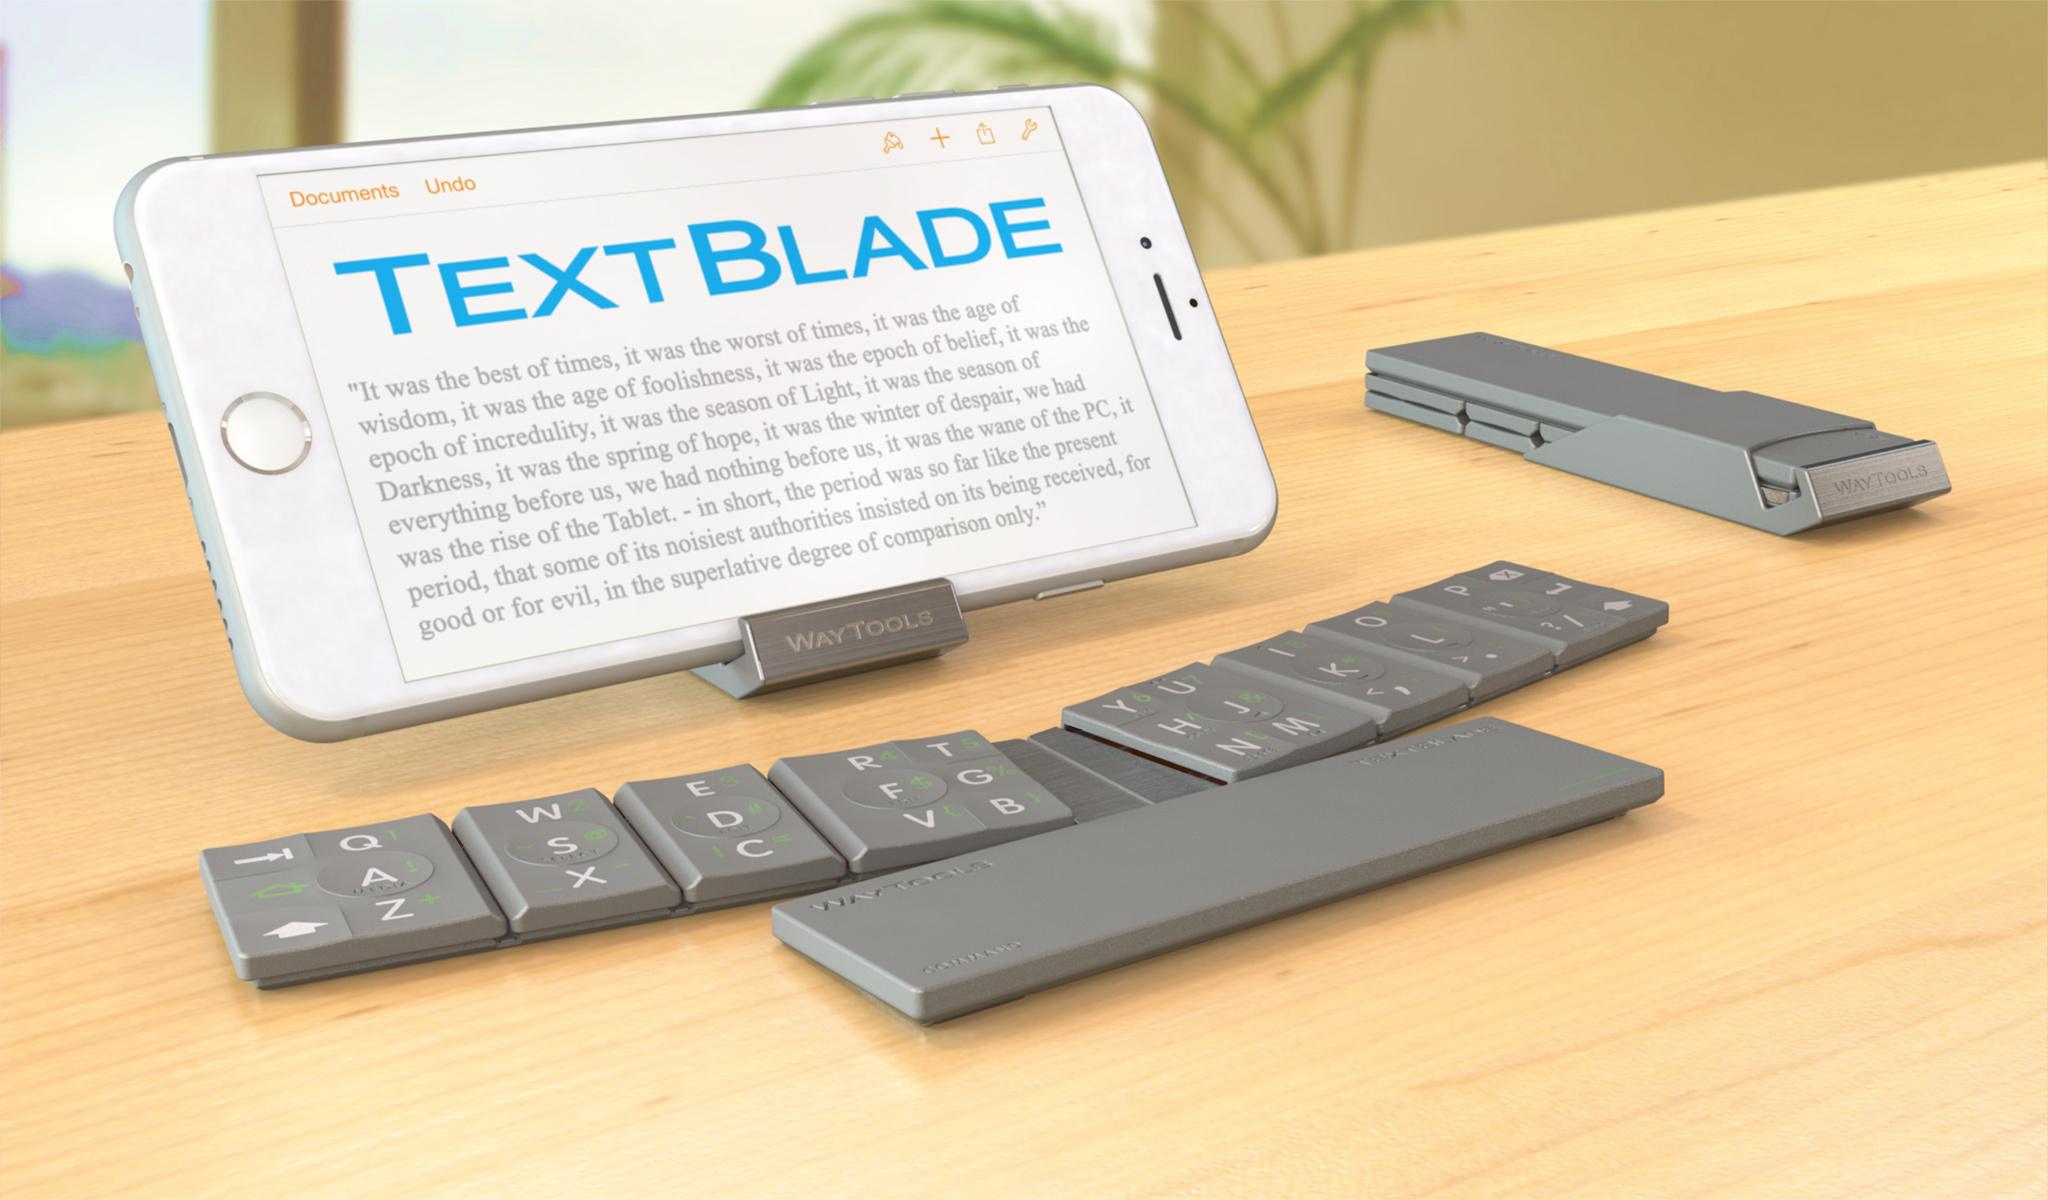 TextBlade